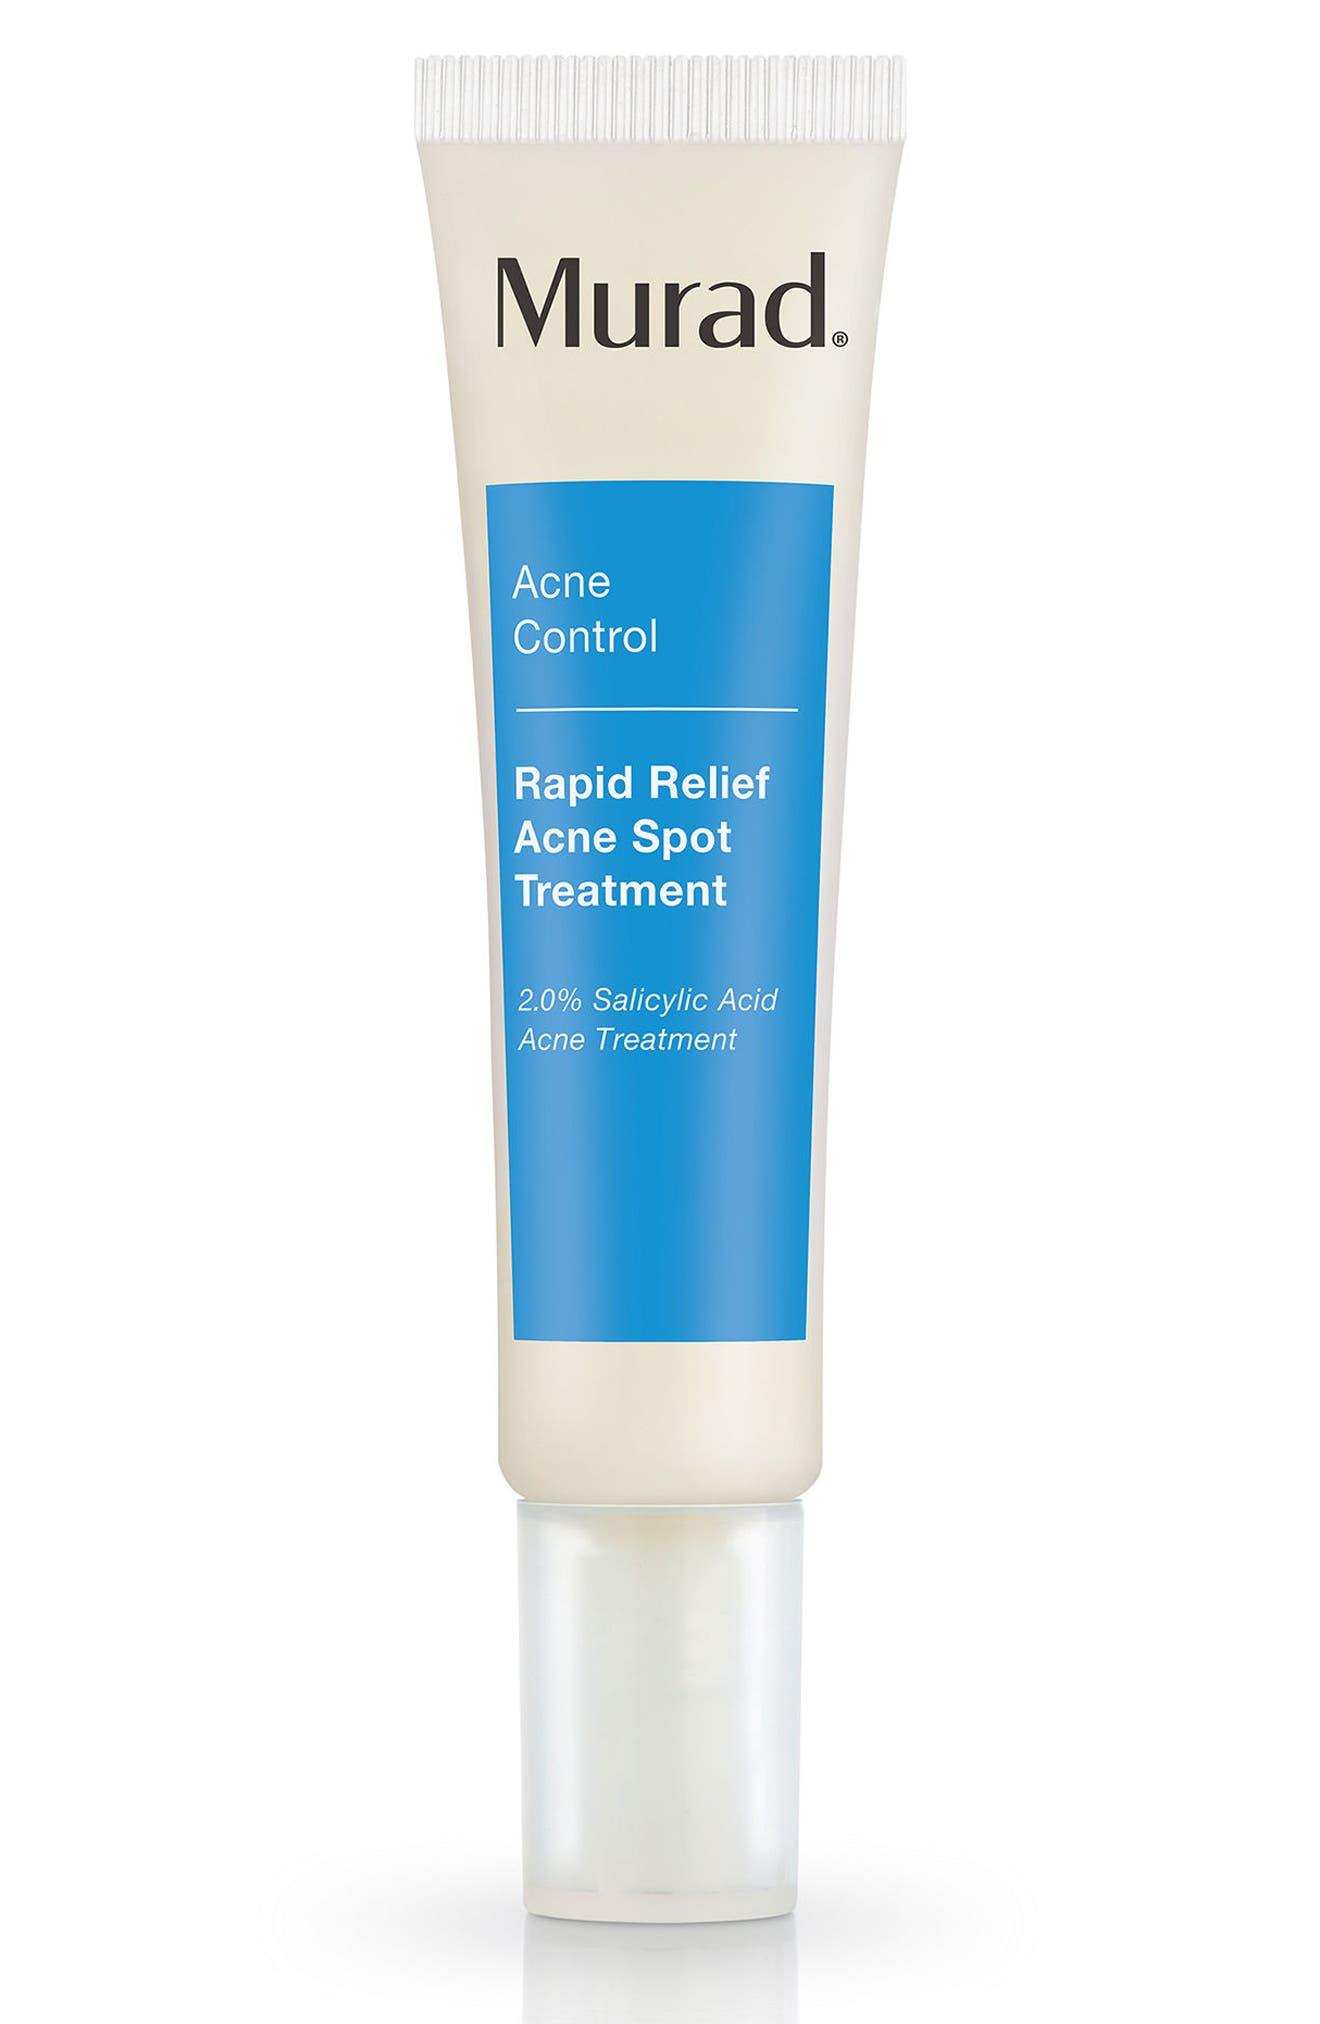 Murad® Rapid Relief Acne Spot Treatment